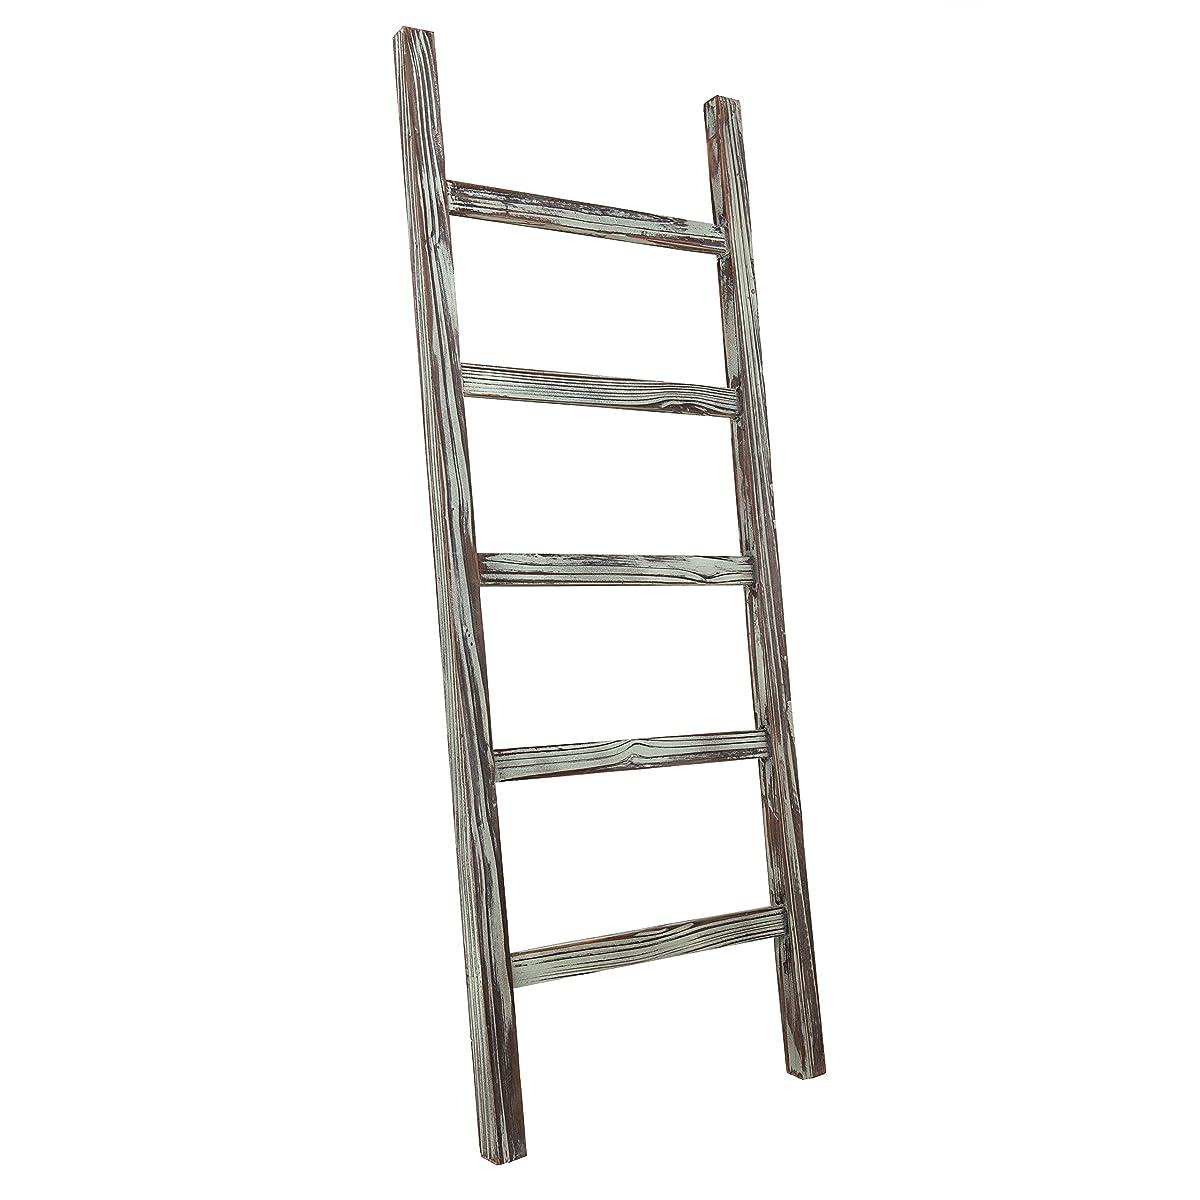 MyGift Decorative Rustic Barnwood 5-Rung Blanket Ladder Organizer, Hanging Towel Bar Rack - 48 x 19-inches